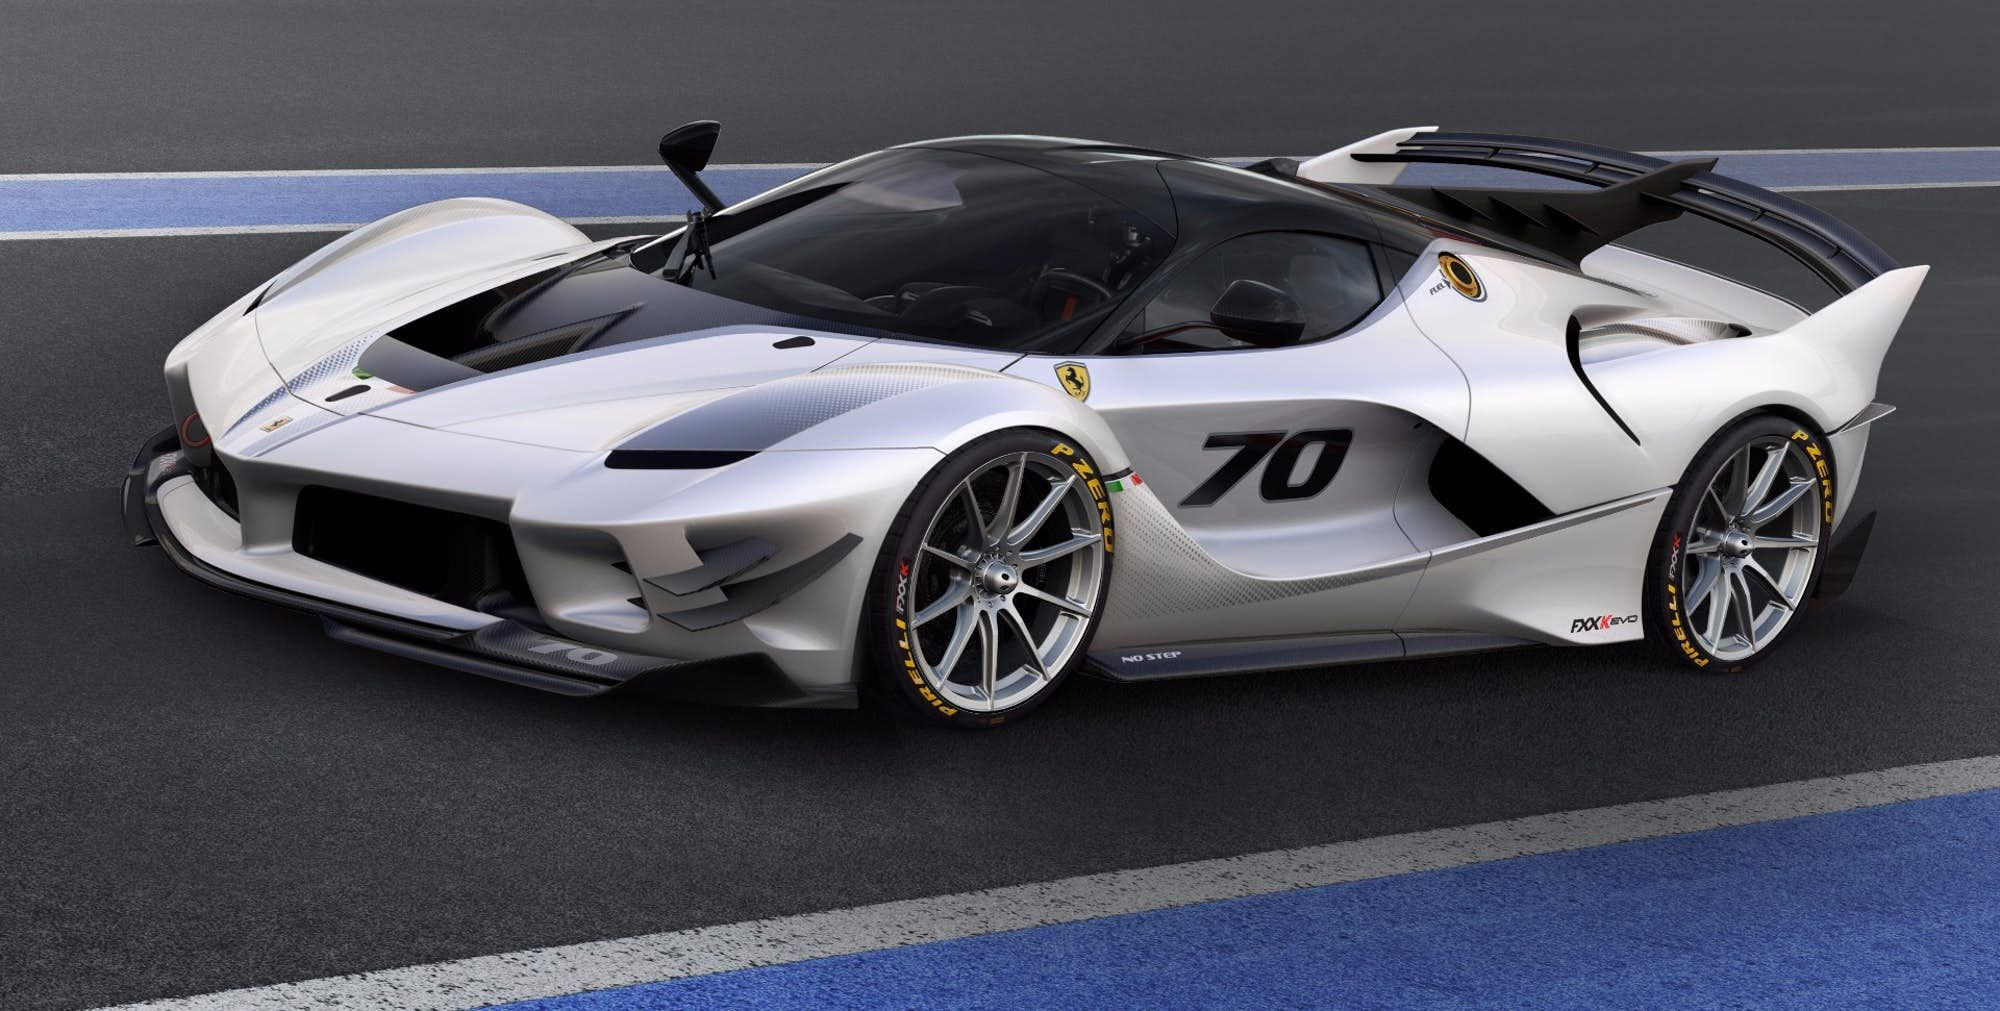 Ferrari S Ludicrous Fxx K Evo An Aerodynamics Lab On Wheels Ferrari Fxx Ferrari Fxxk Sports Cars Luxury Ferrari laferrari fxx k evo rear